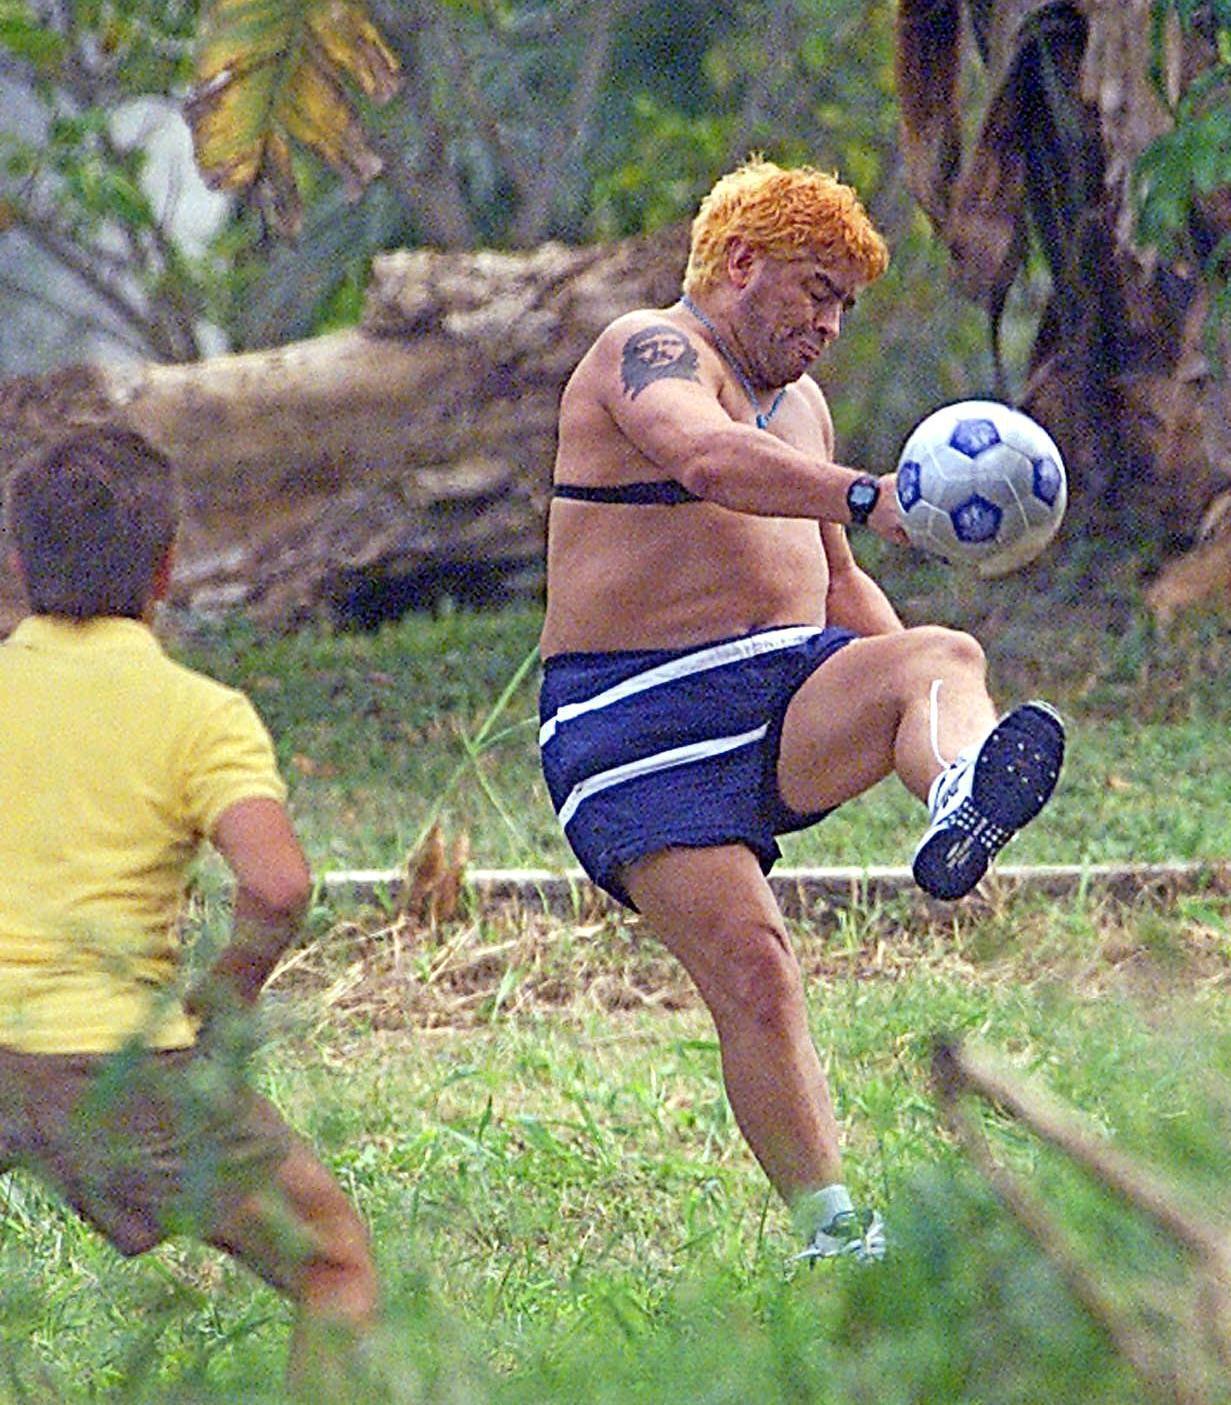 Bild zu Diego Maradona, Rehabilitation, Garten, Fußball, Kuba, Las Praderas